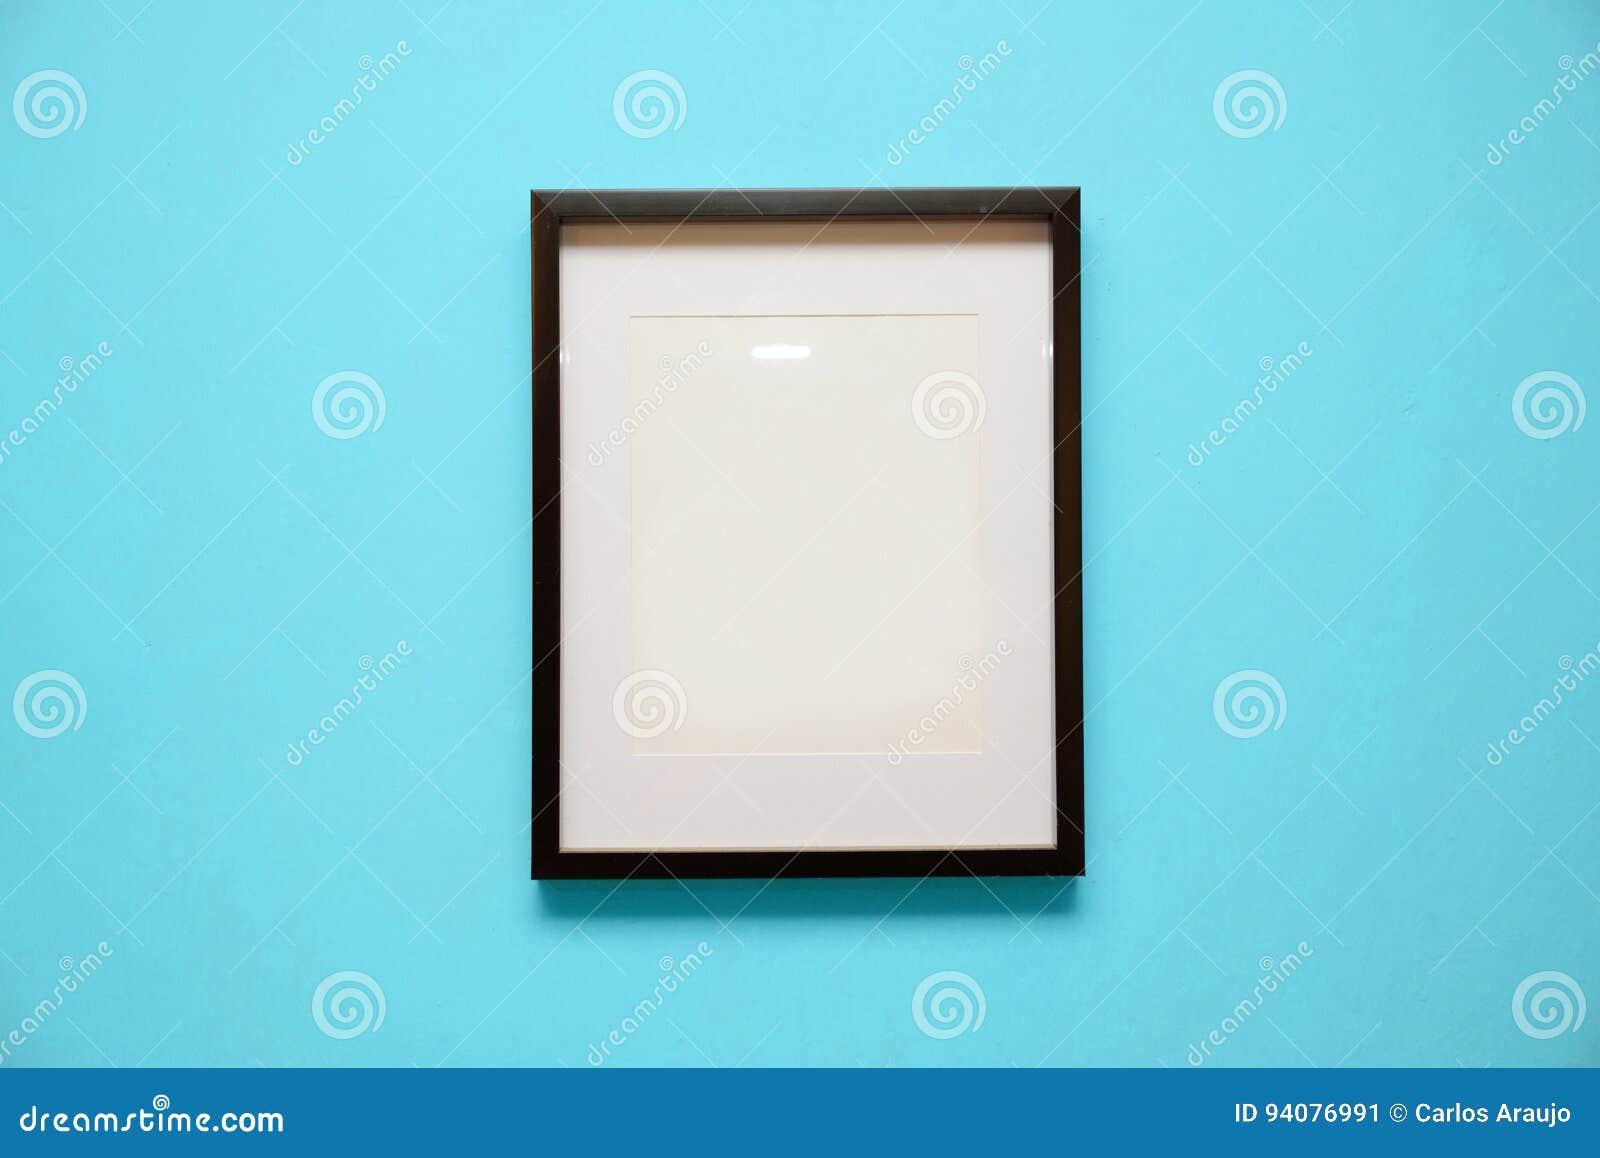 design cadre mur bleu cuisine design et d coration photos. Black Bedroom Furniture Sets. Home Design Ideas